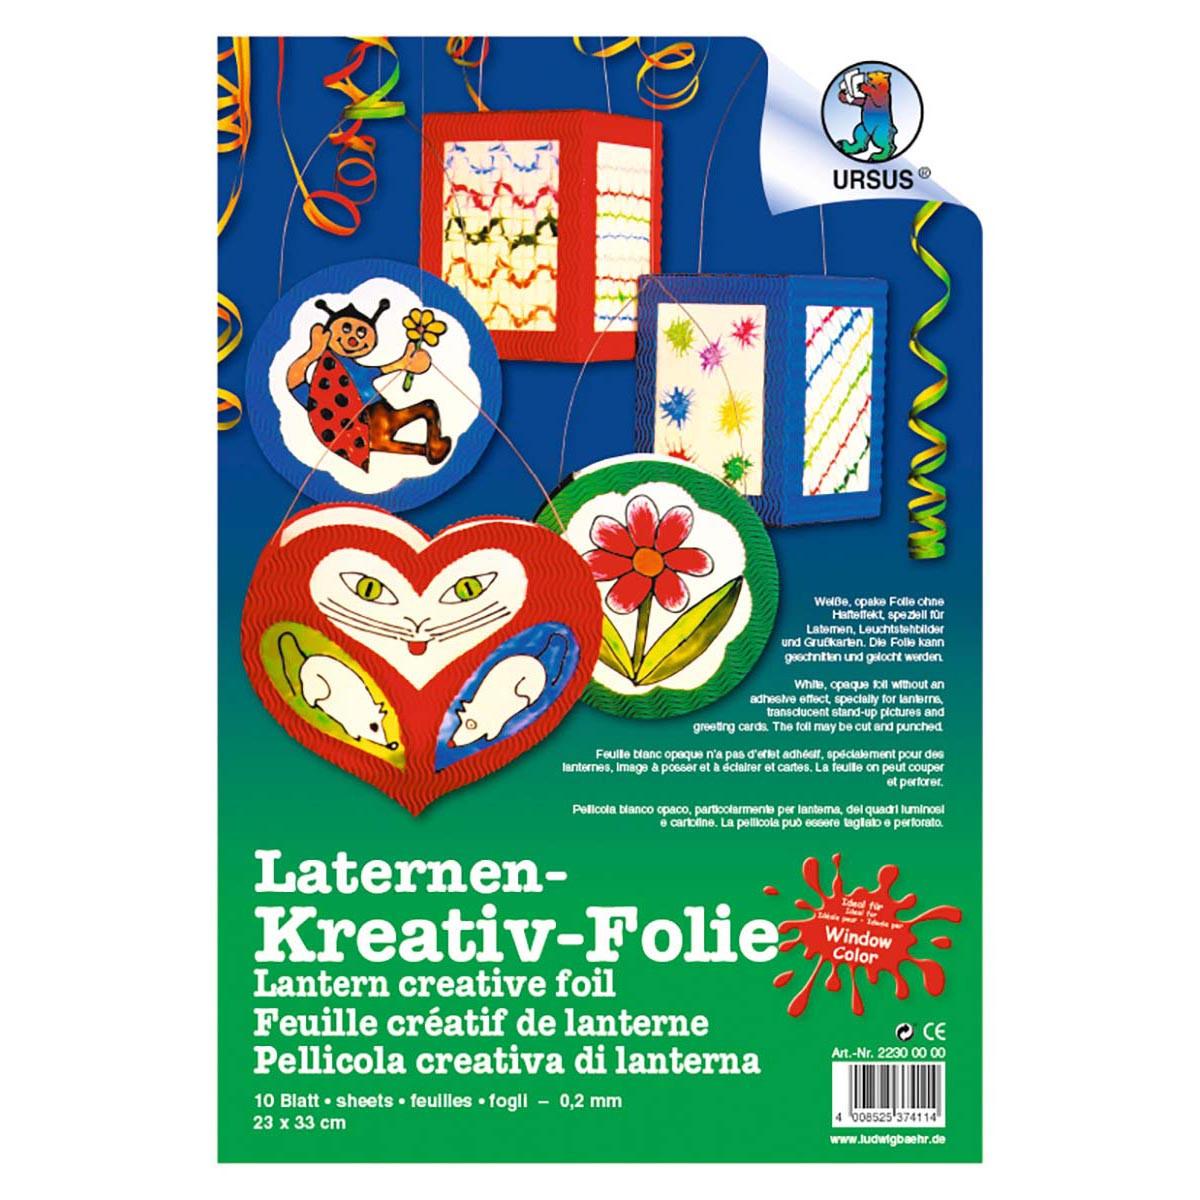 Laternen-Kreativ-Folie 23 x 33 cm - 10 Blatt